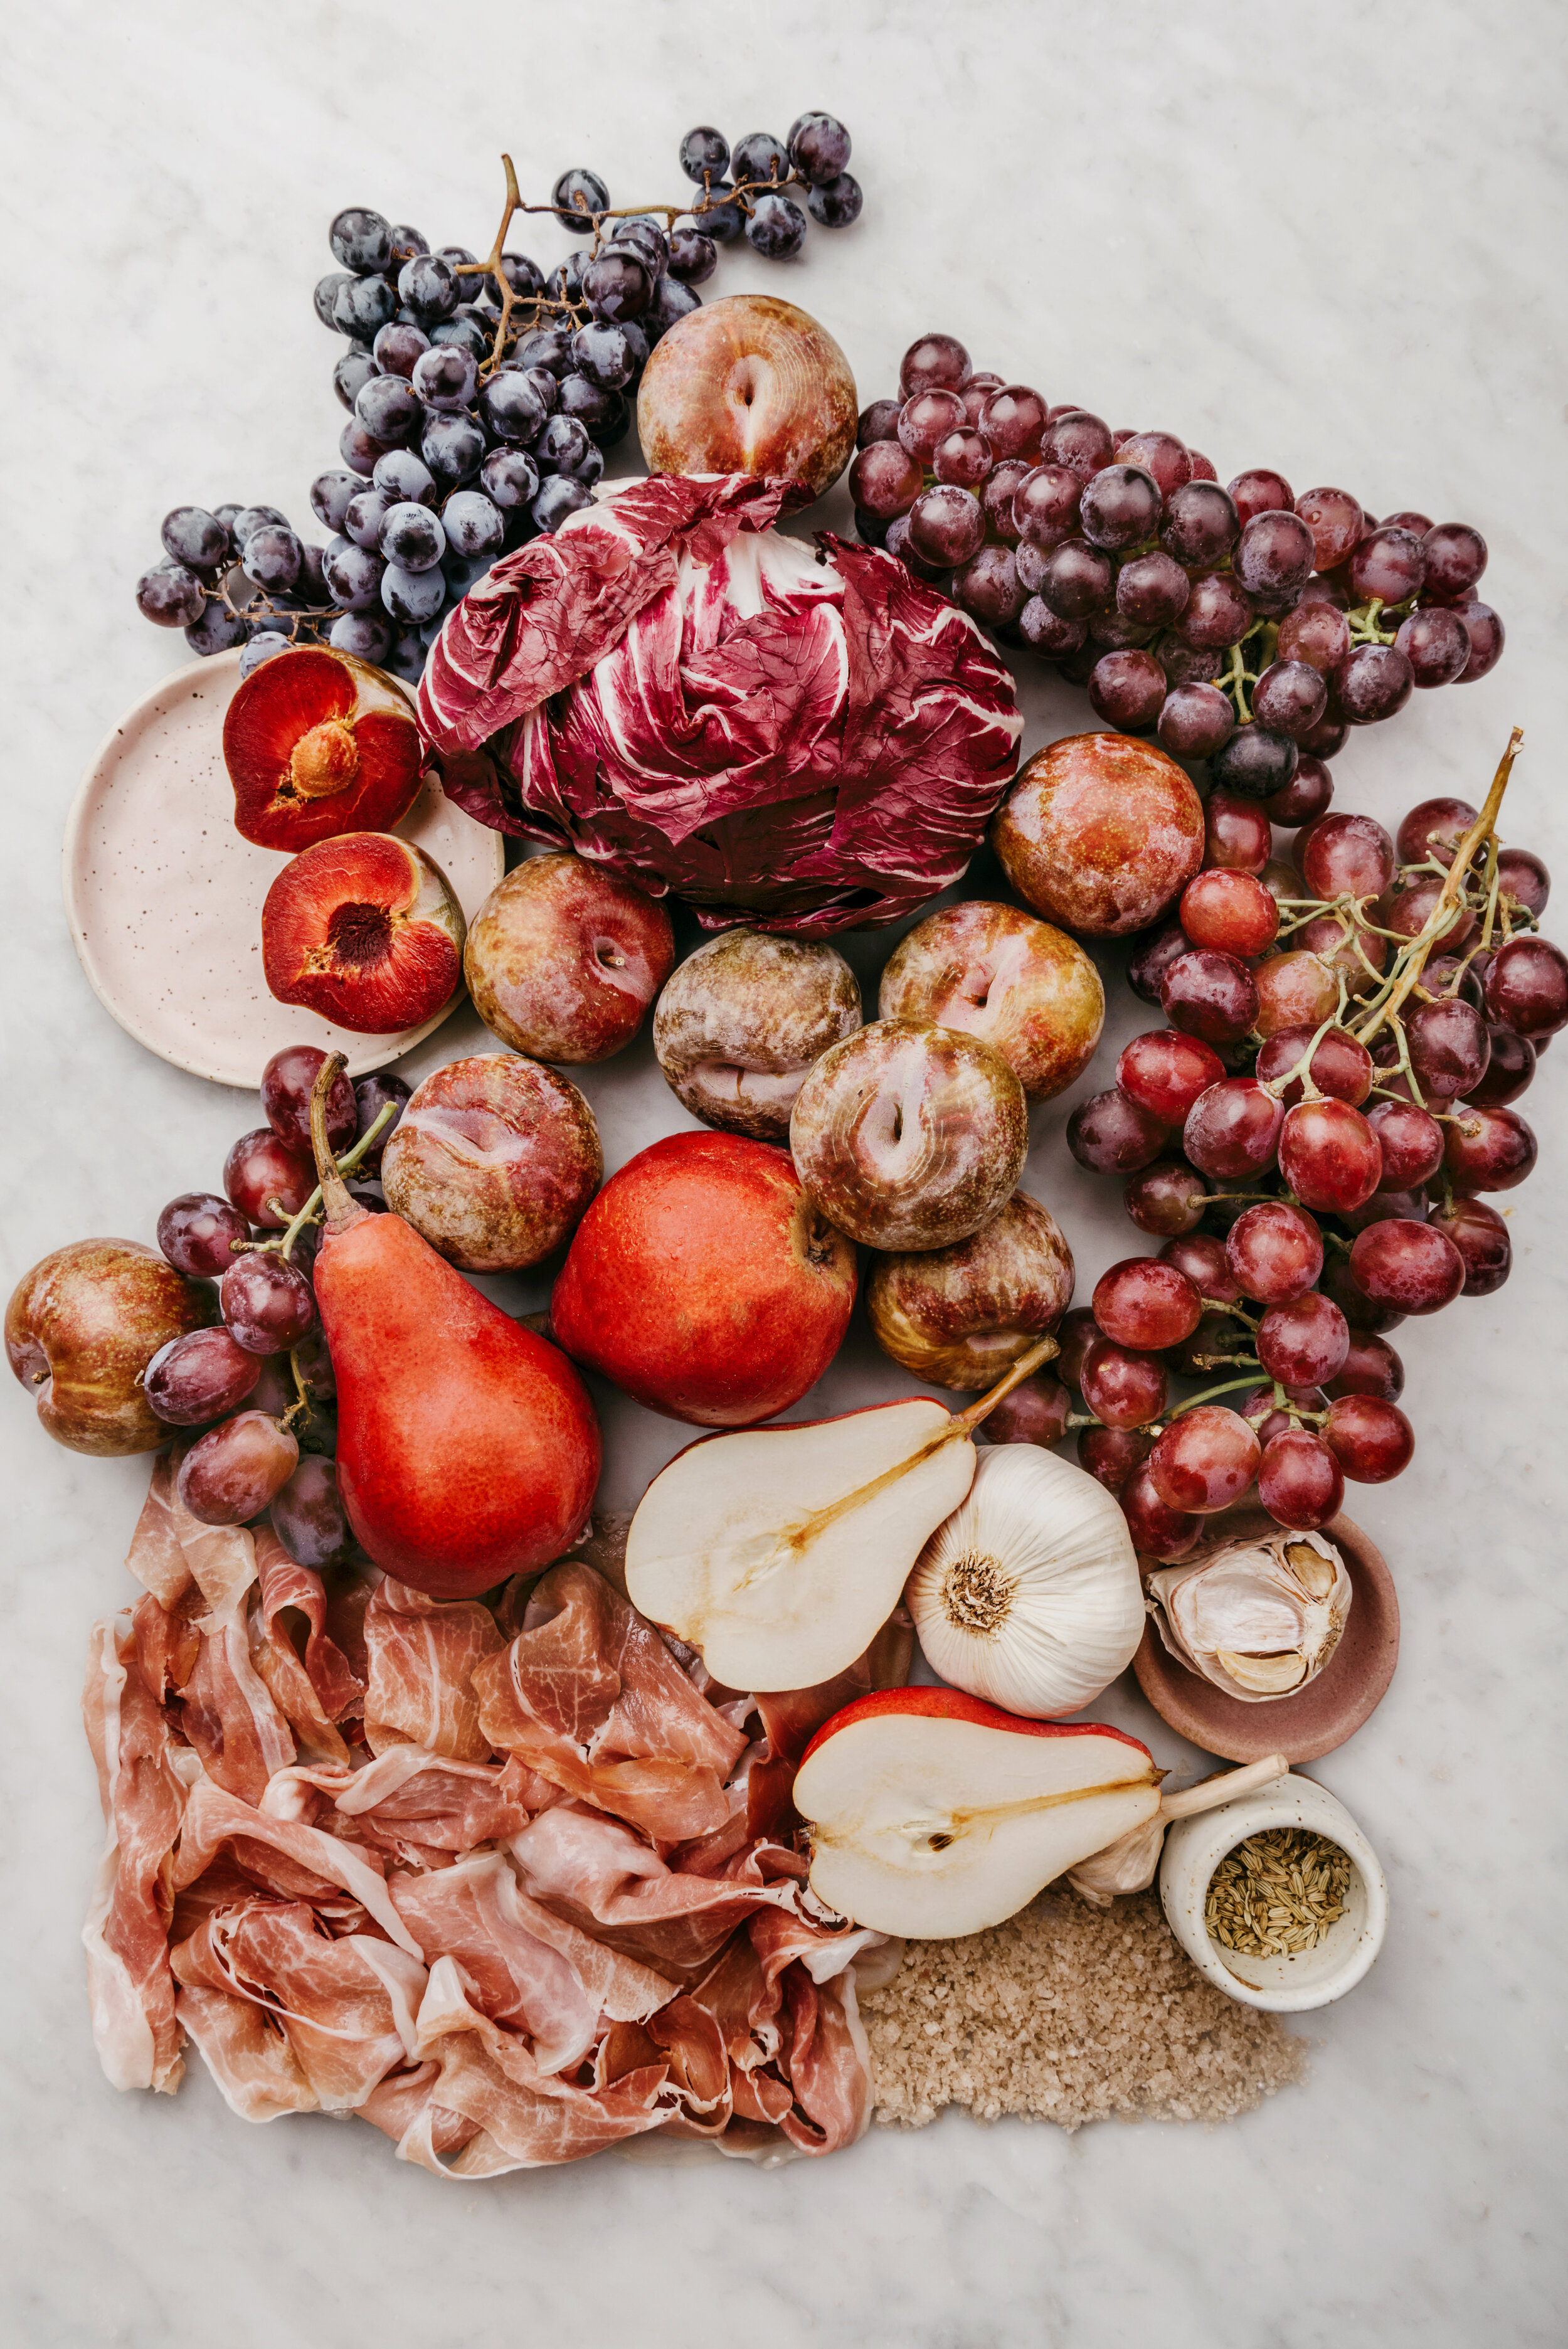 FALL FRUIT OMBRE by Sarah Copeland #ombre #fallfruits #edibleliving #sarahcopeland